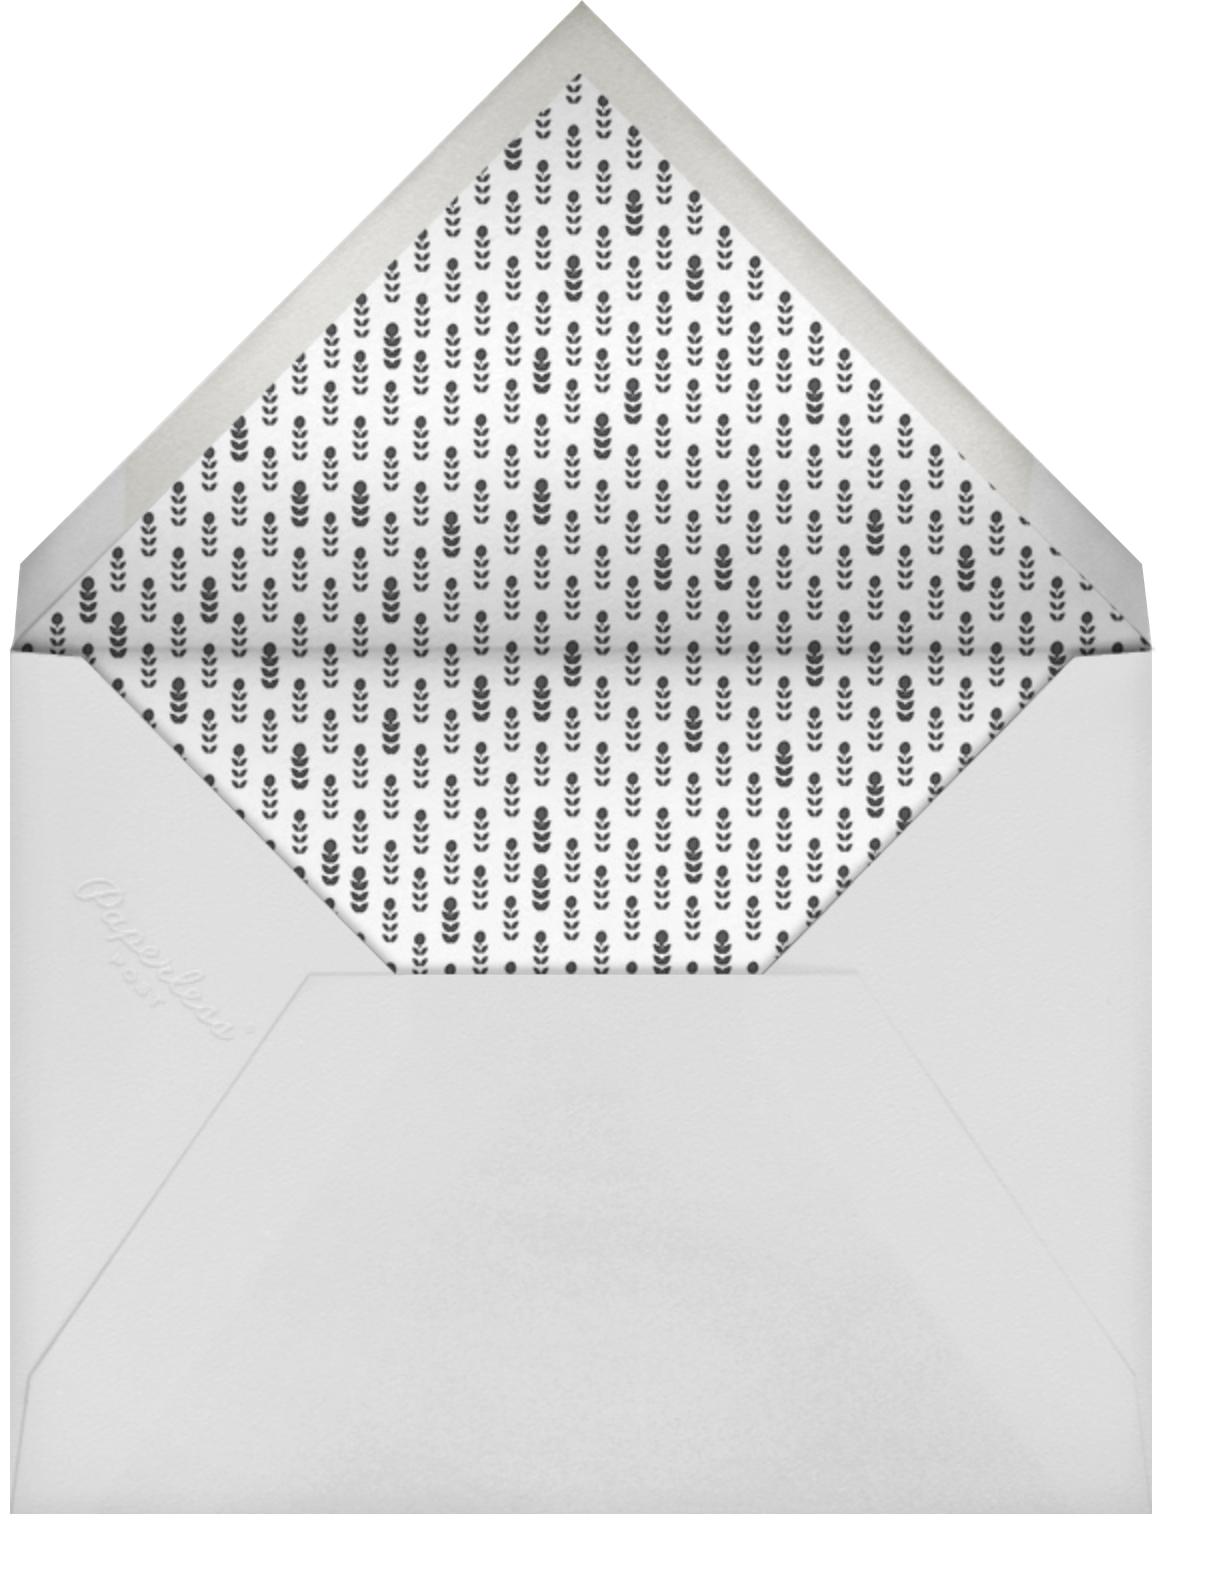 Horizontal Photo on Tall (Invitation) - Paperless Post - Memorial service - envelope back